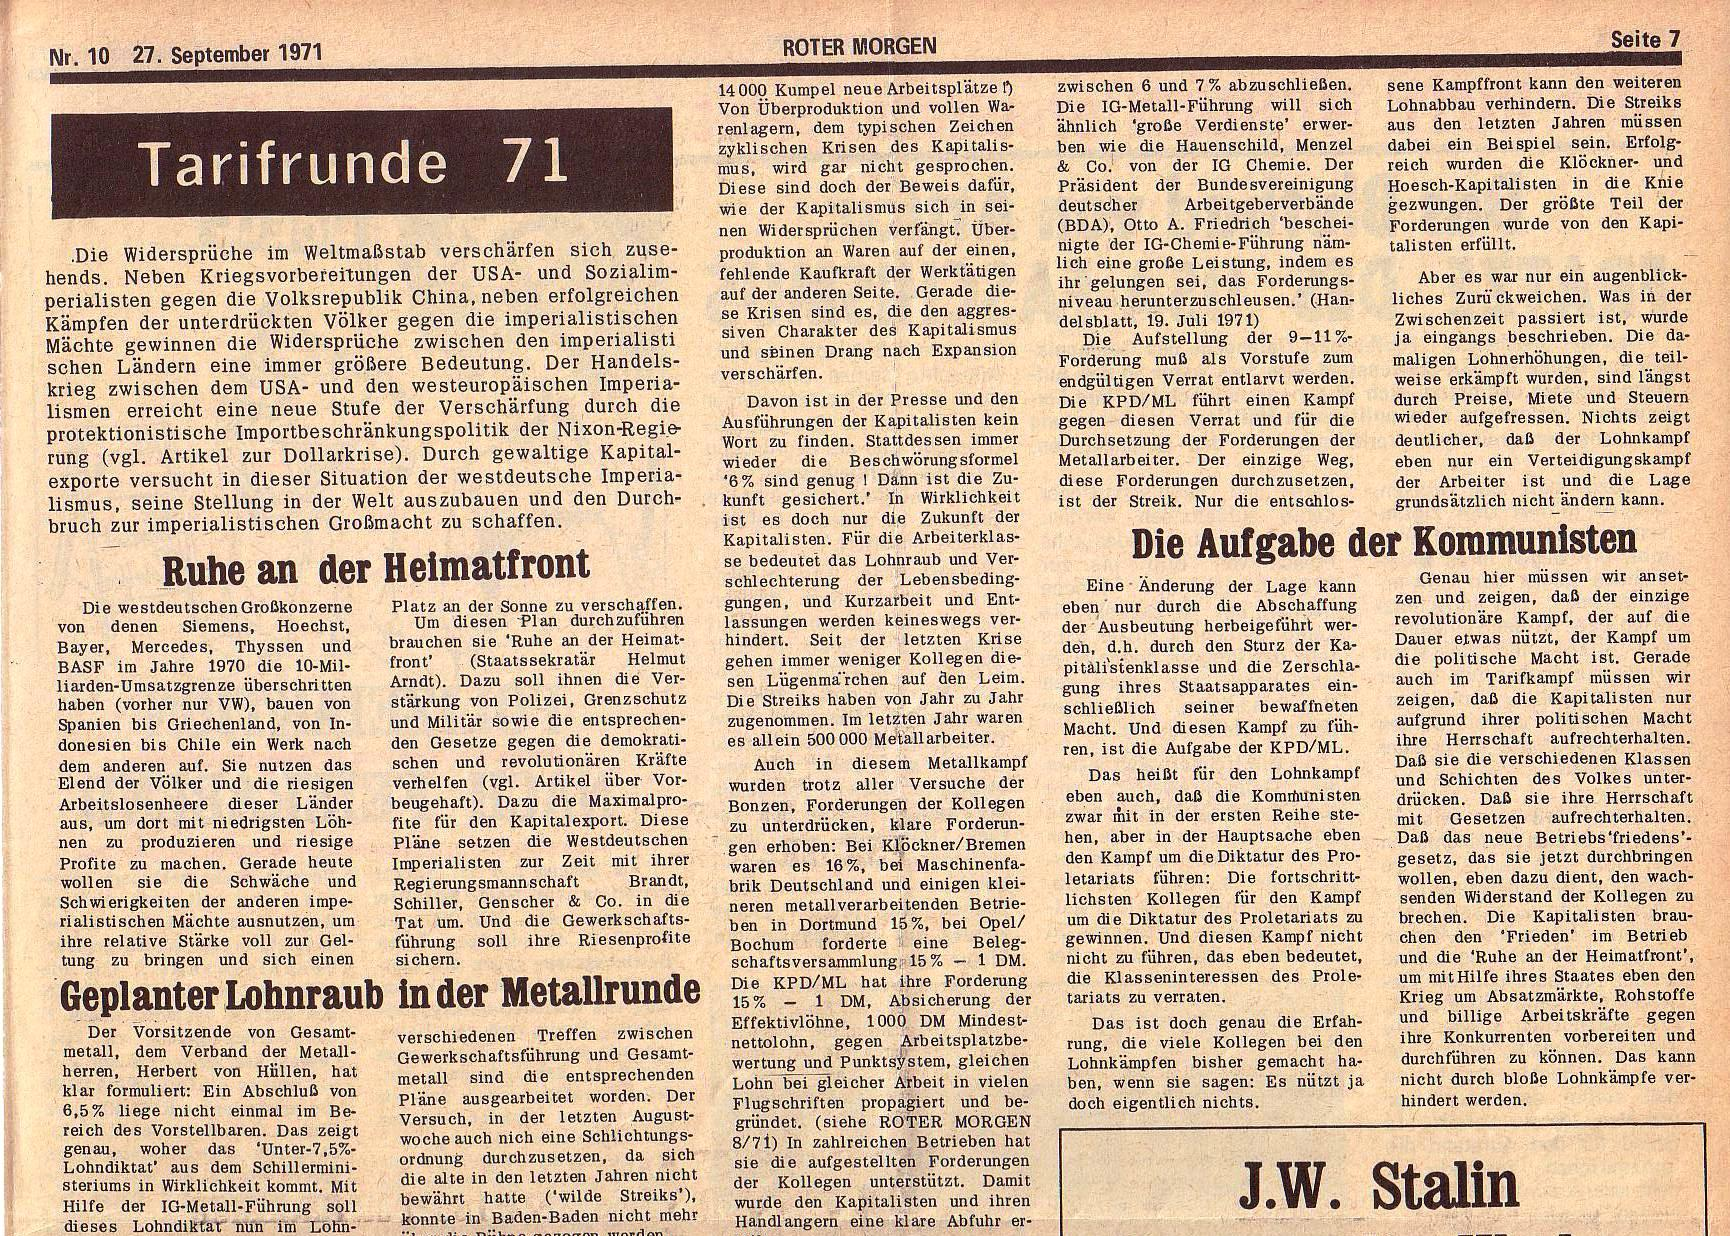 Roter Morgen, 5. Jg., 27. September 1971, Nr. 10, Seite 7a